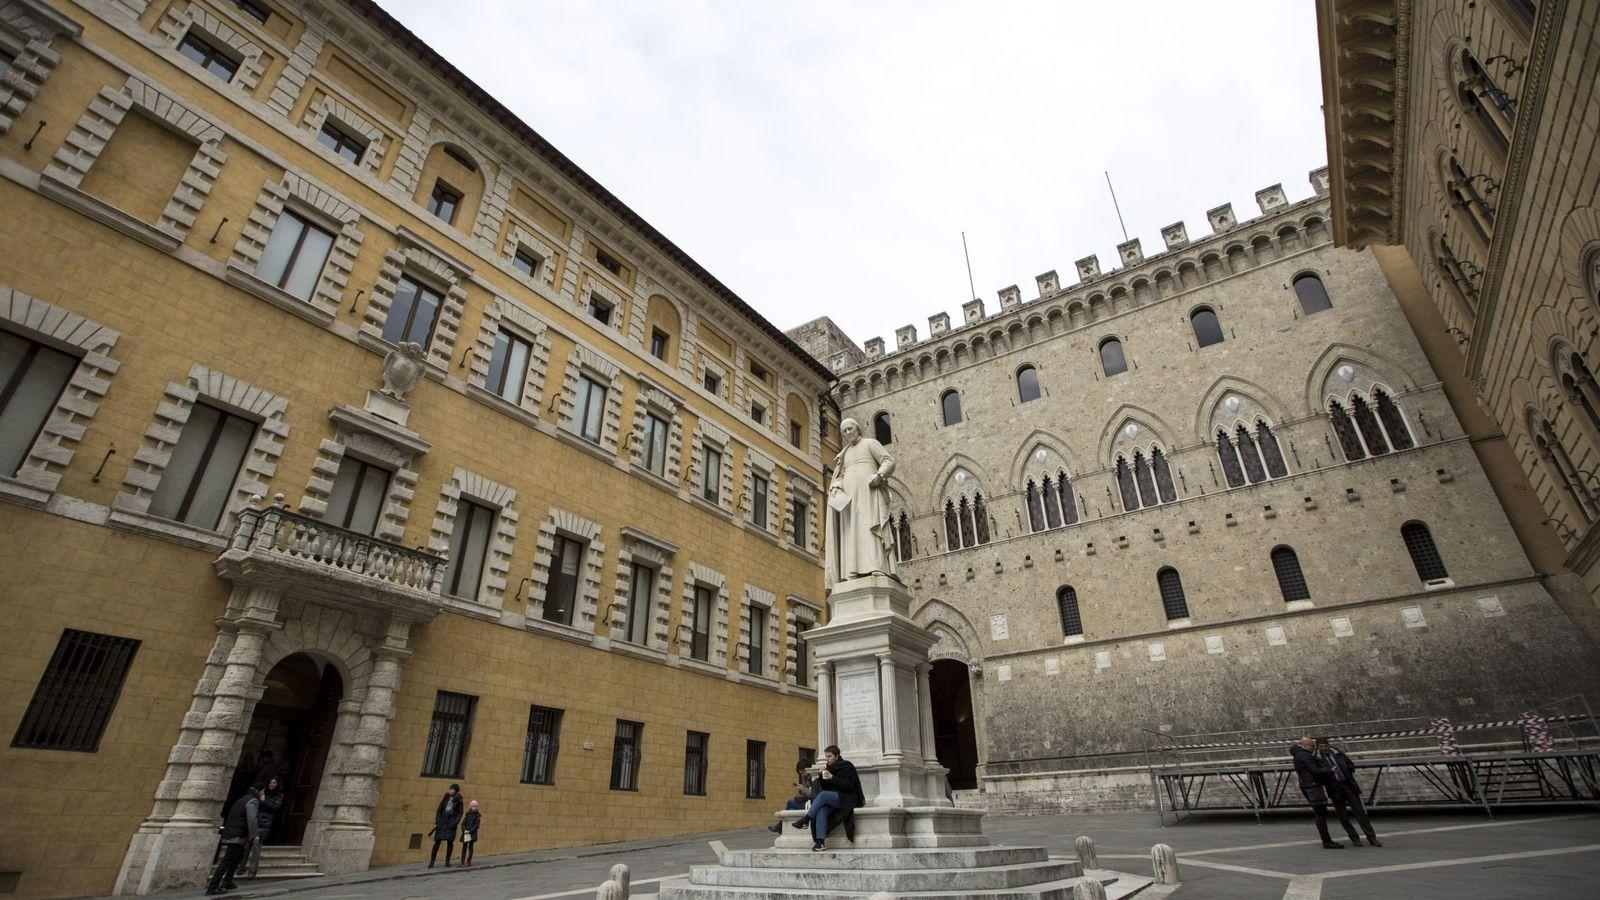 Foto: Fachada de la sede de la italiana Banca Monte dei Paschi di Siena